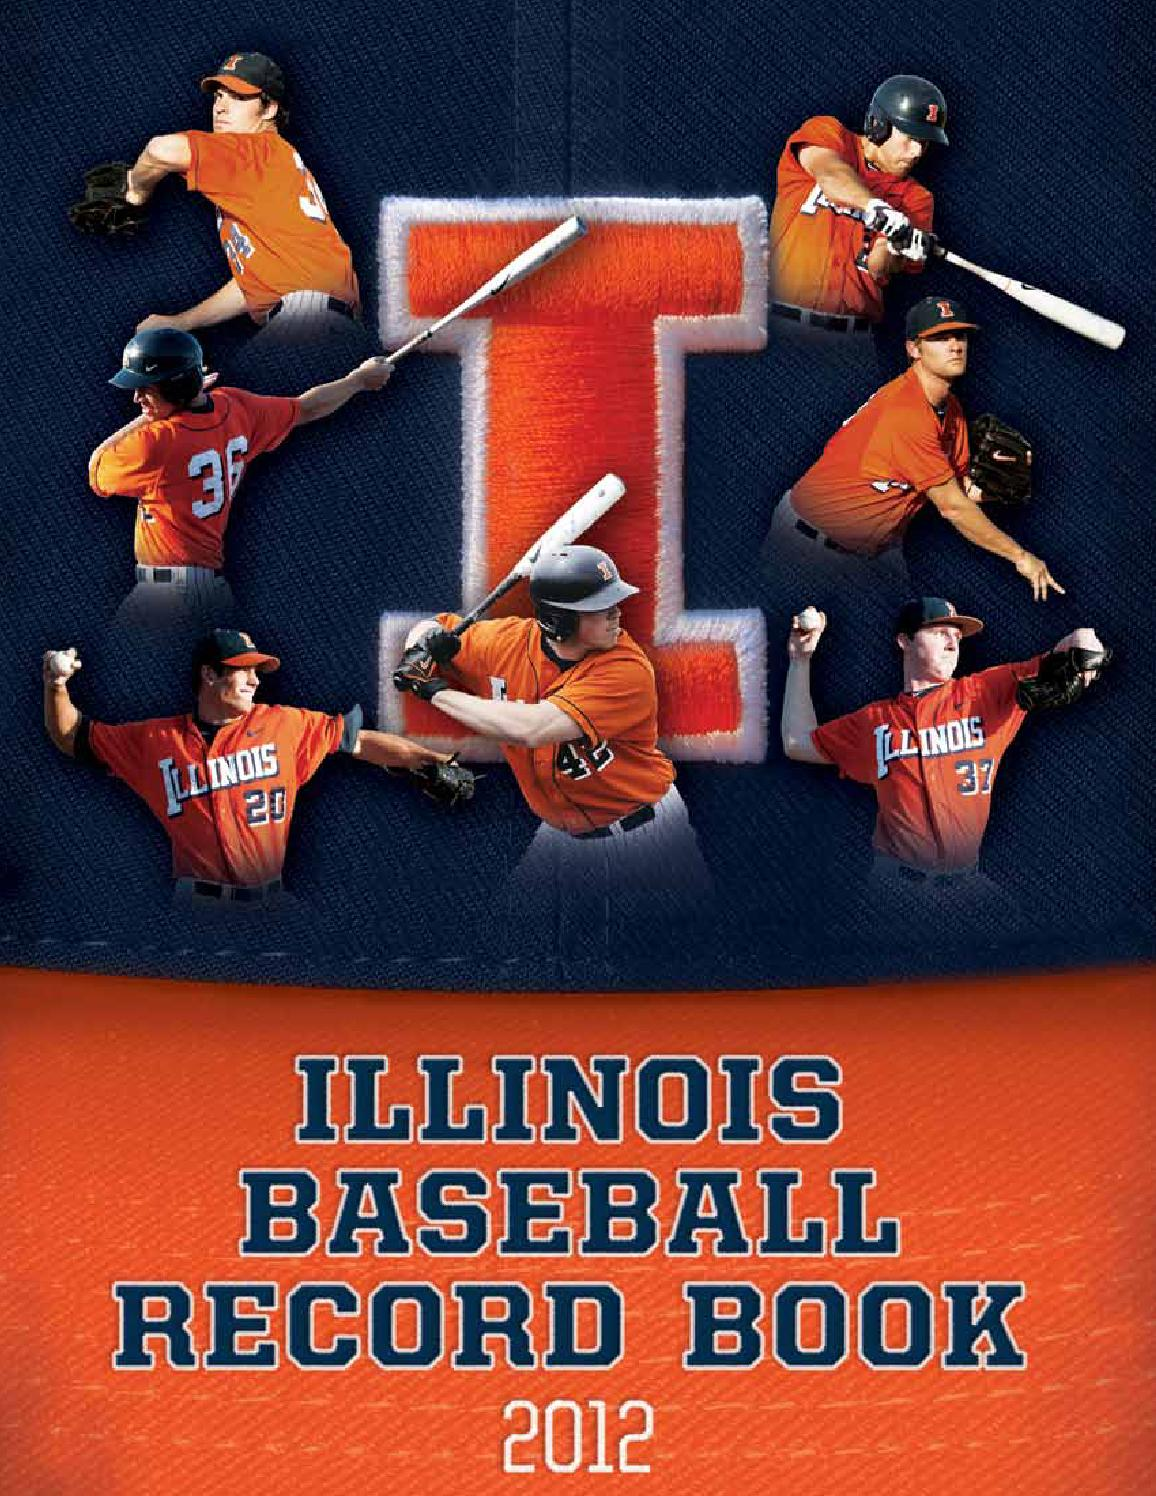 2012 baseball recordbook by illiniathletics - issuu